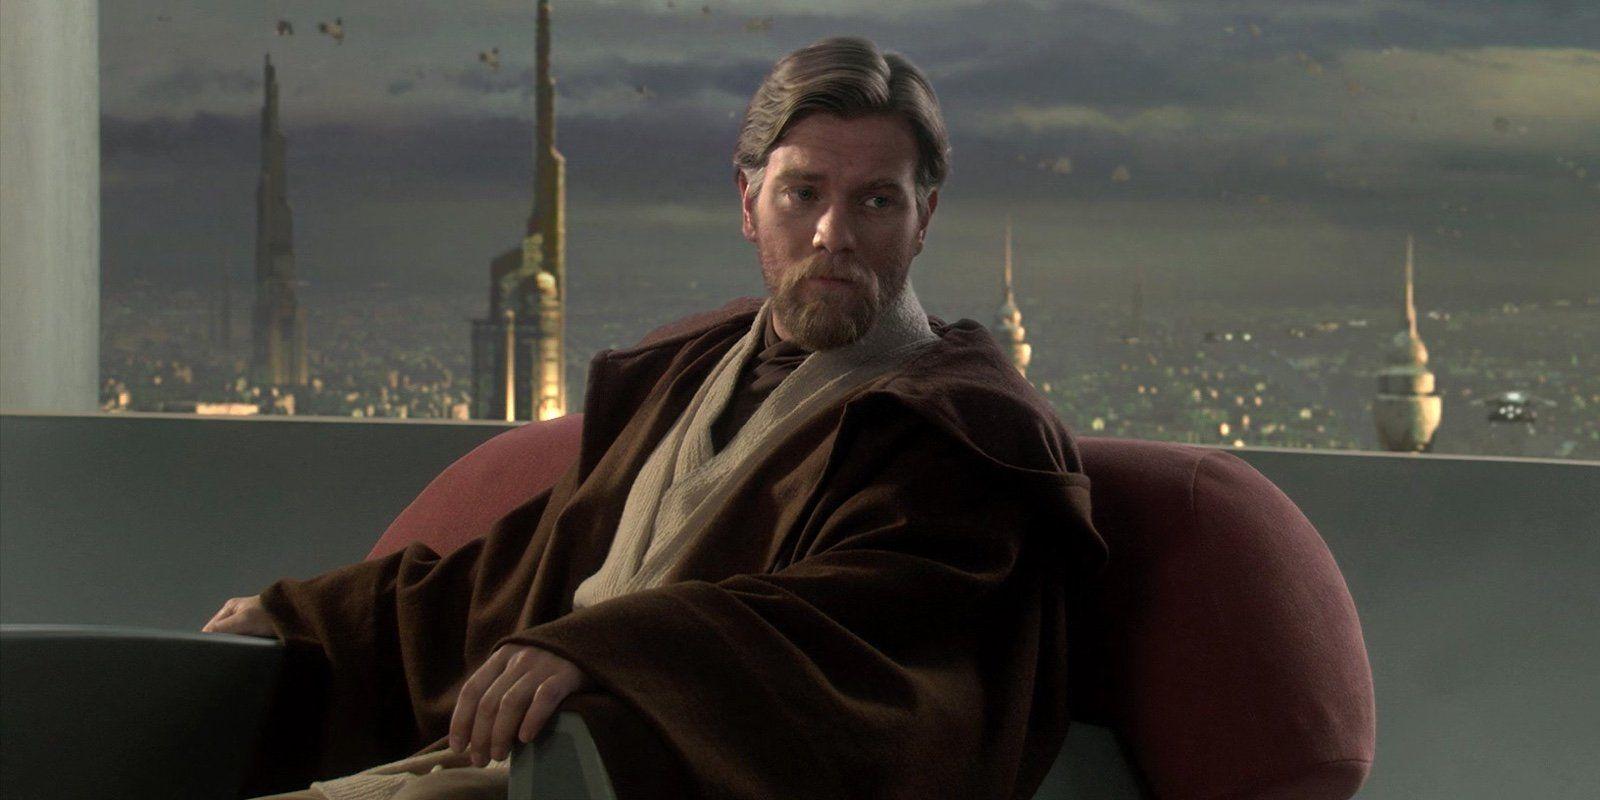 Obi-Wan Kenobi release date